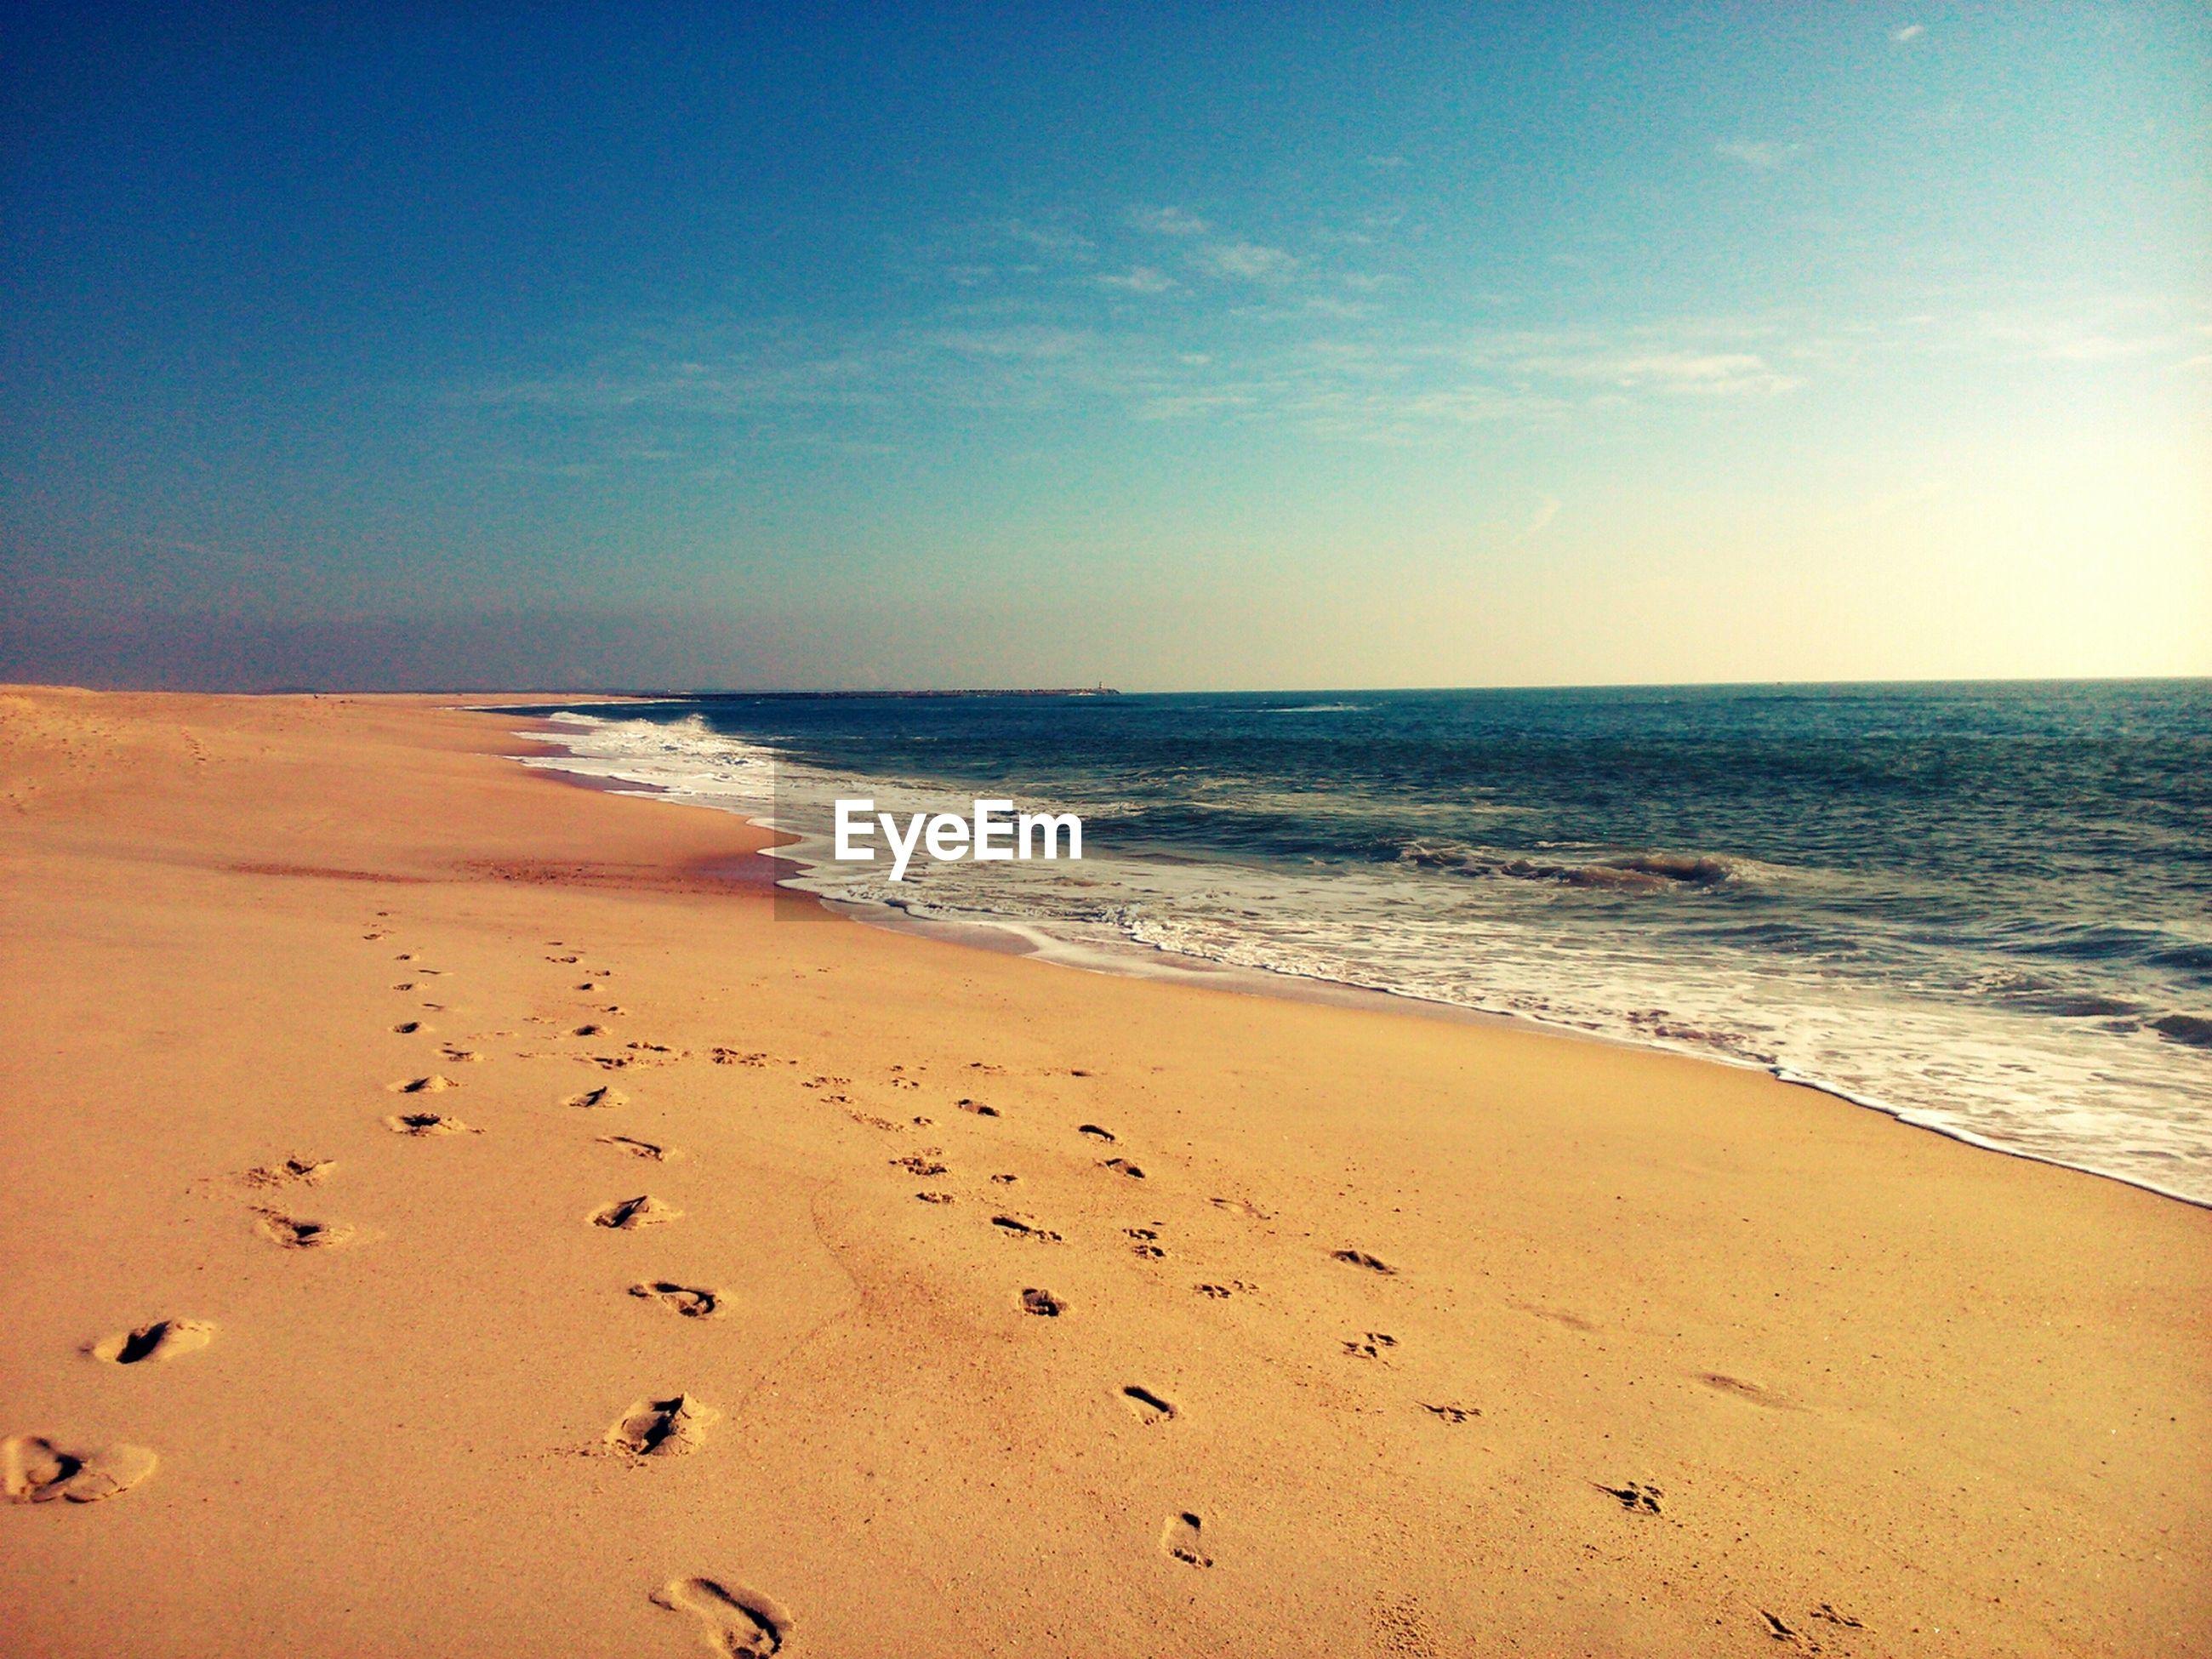 View Of Footprints On Beach